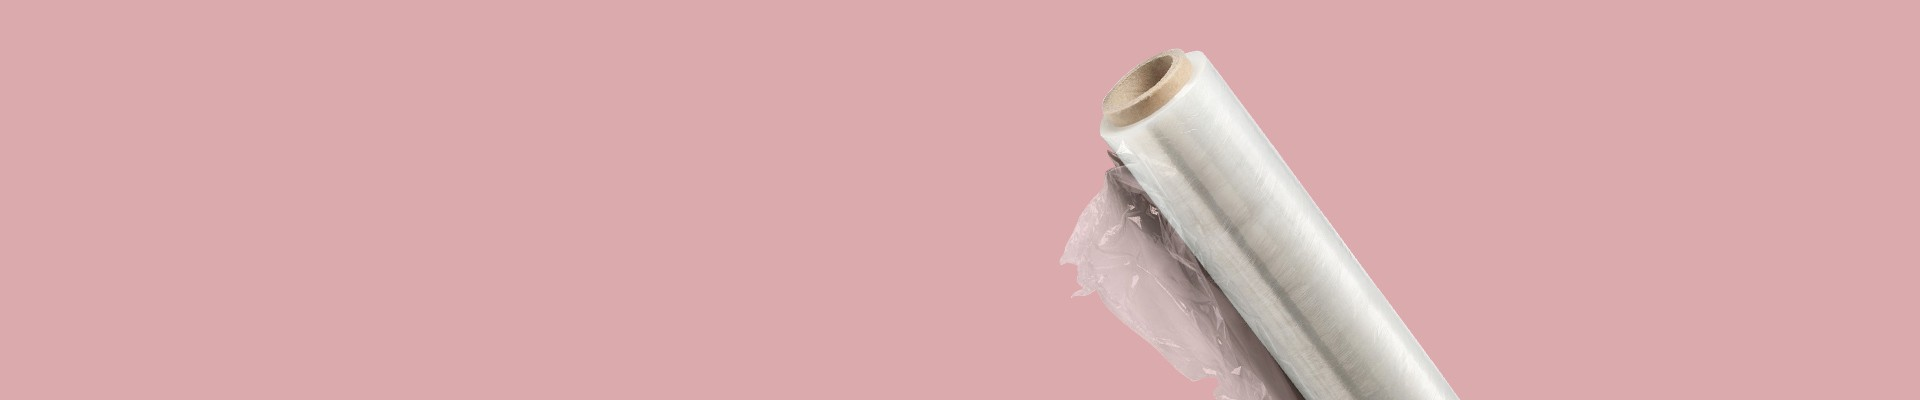 Jual Wrap Plastik - Cling Wrap - Harga Grosir